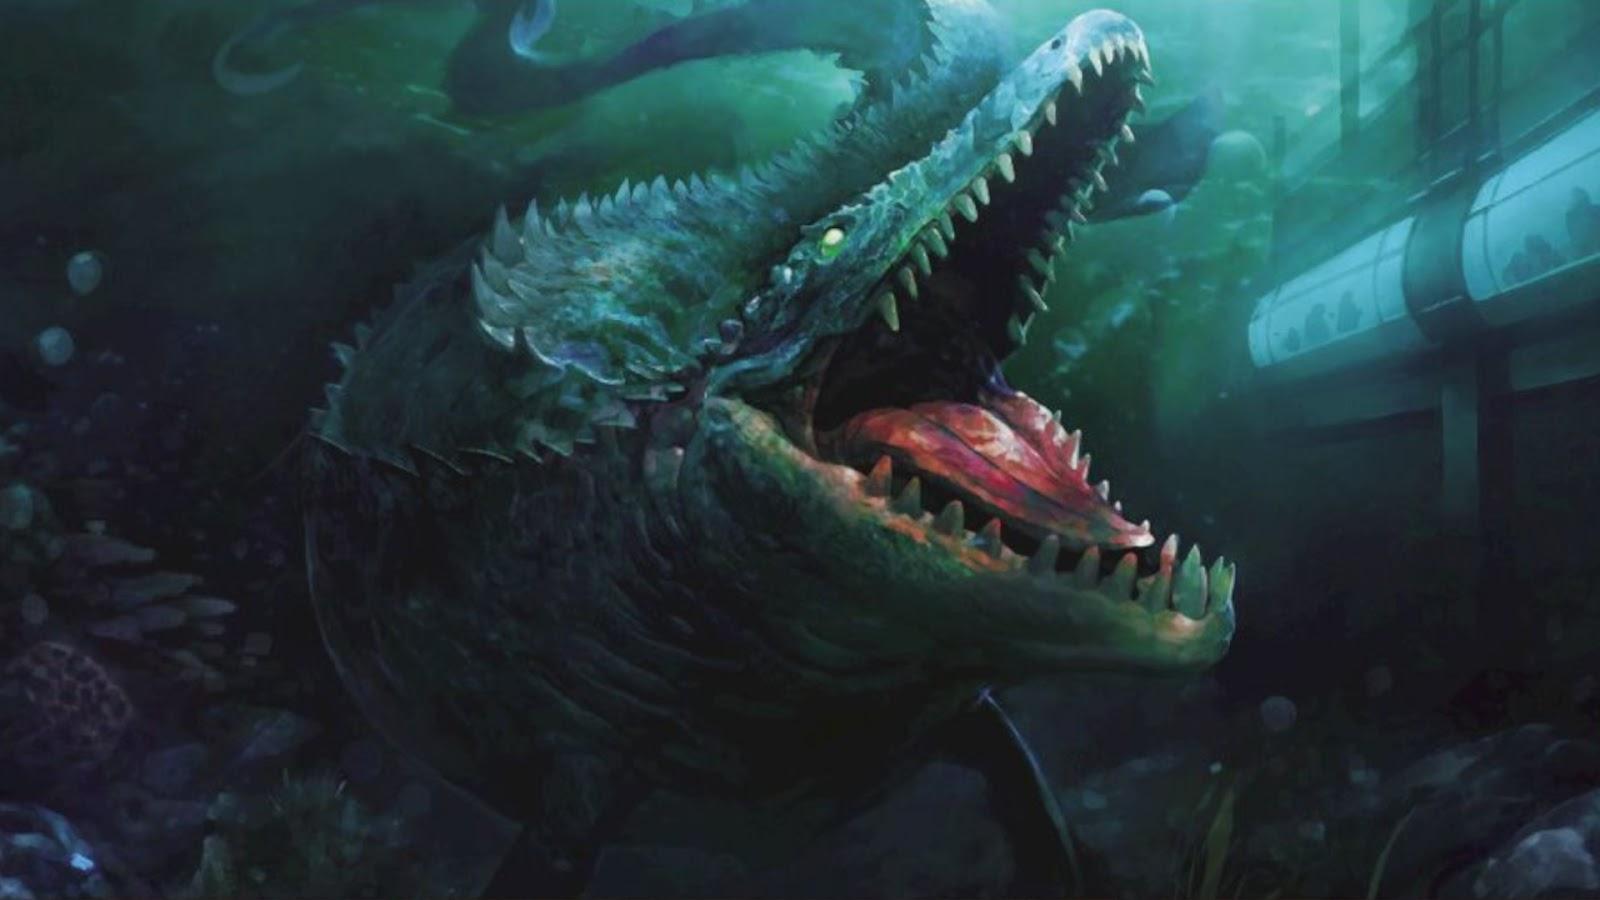 Kickstarter Highlights - DinoGenics Controlled Chaos